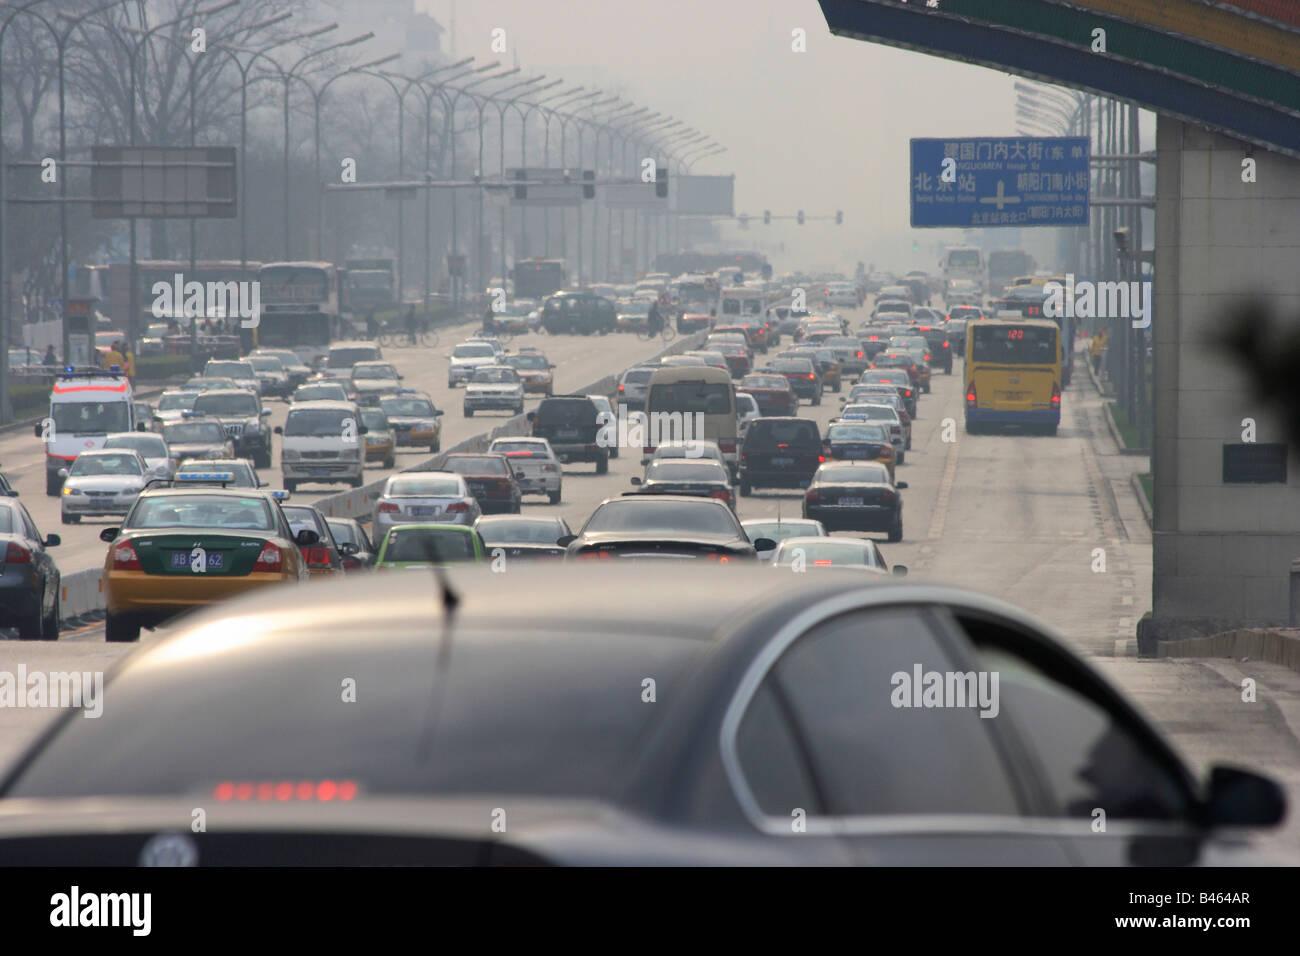 Multilane arterial road, Beijing, China - Stock Image